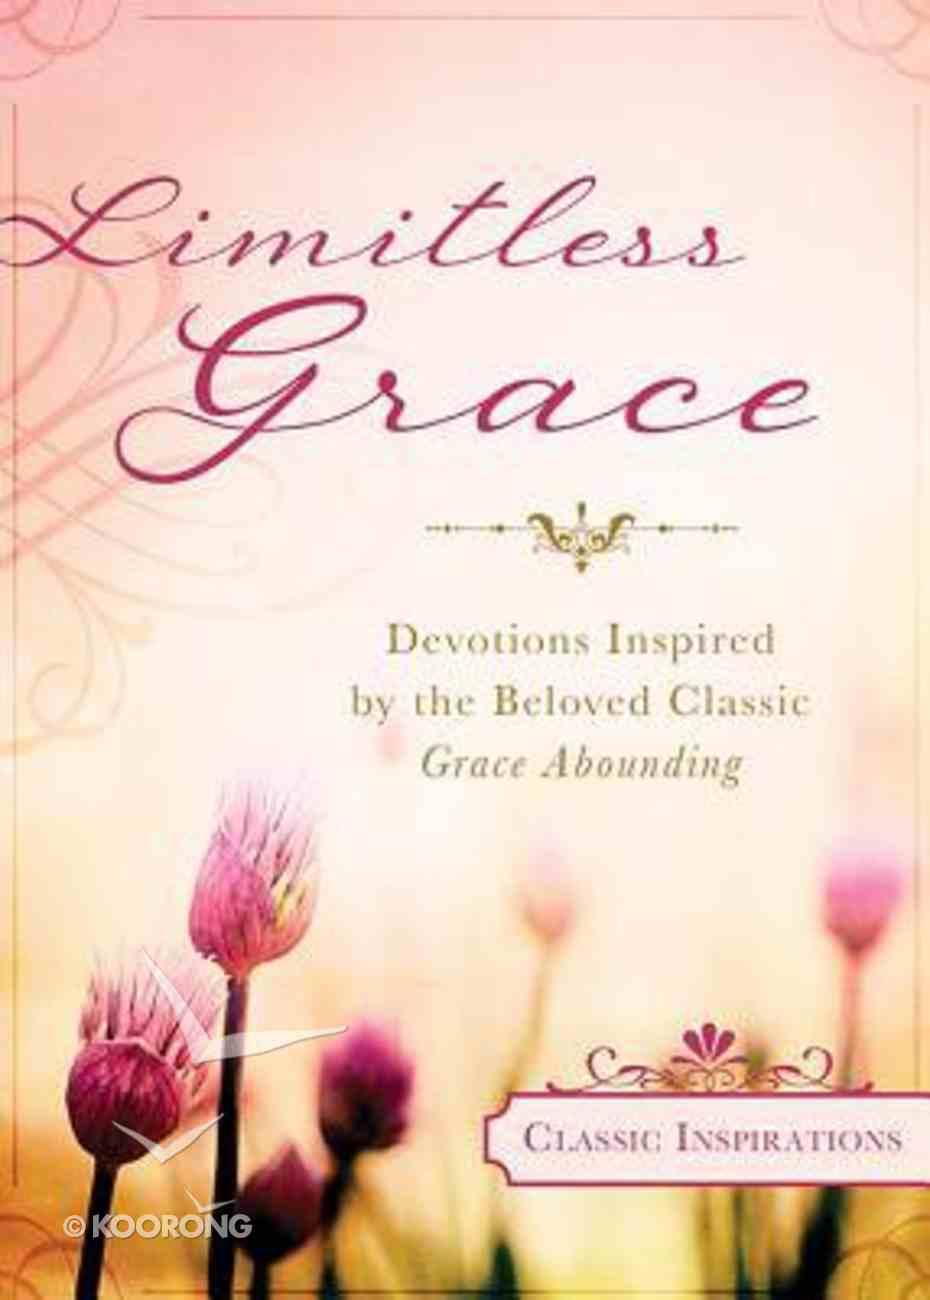 Classic Inspiration: Limitless Grace Paperback